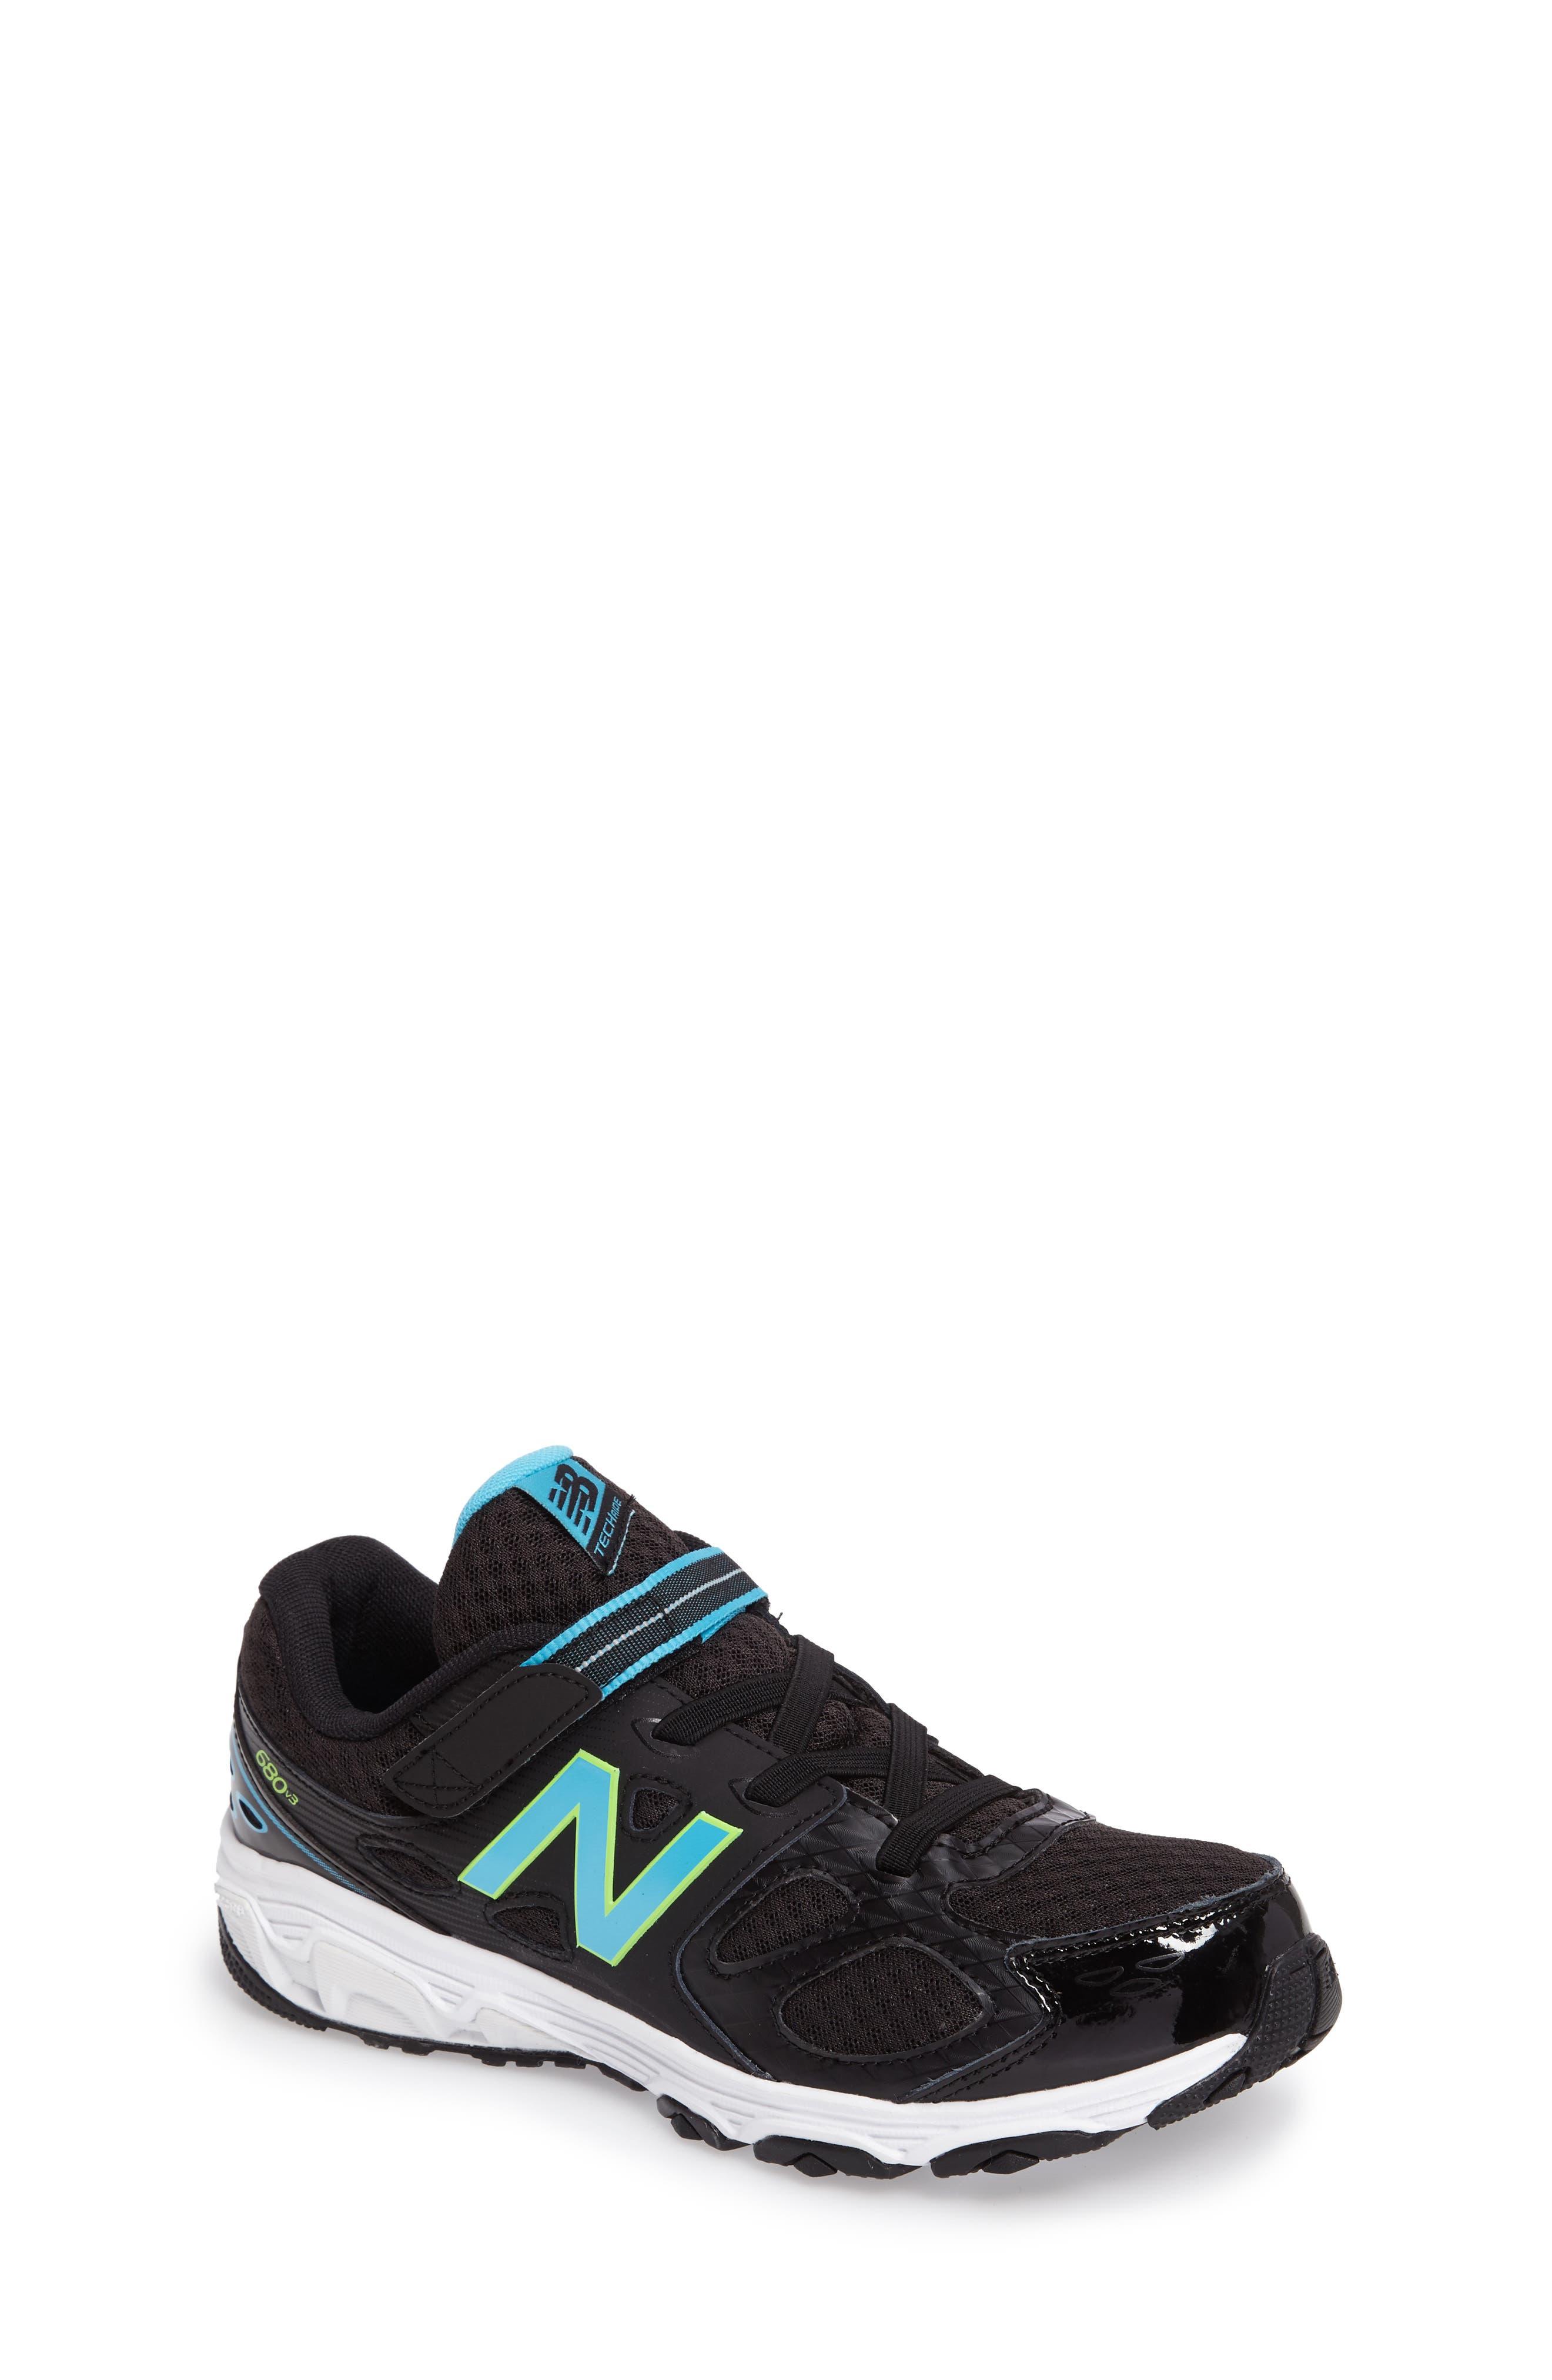 Main Image - New Balance 680v3 Sneaker (Baby, Walker, Toddler, Little Kid & Big Kid)